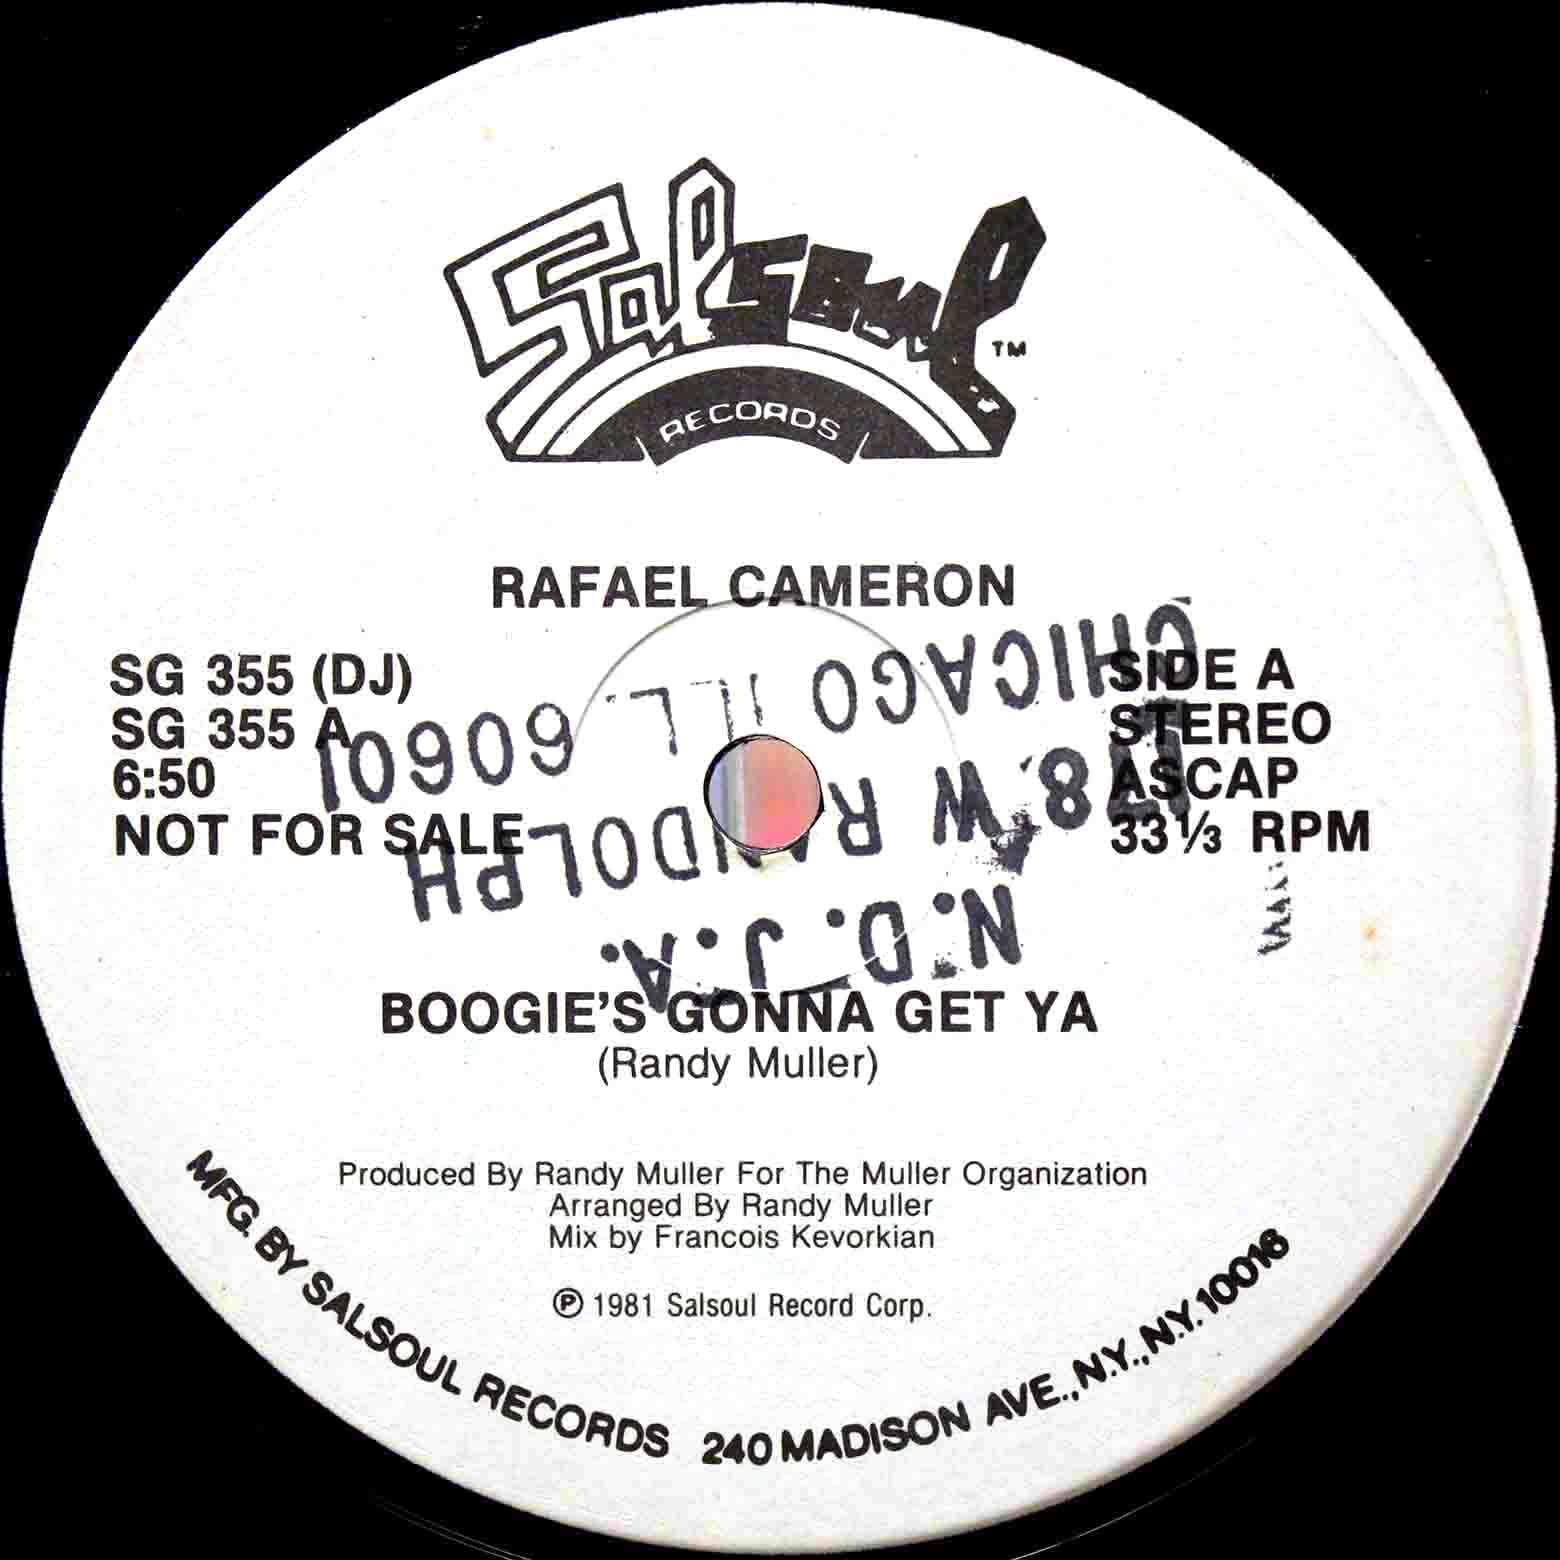 Rafael Cameron – Boogies Gonna Get Ya 03